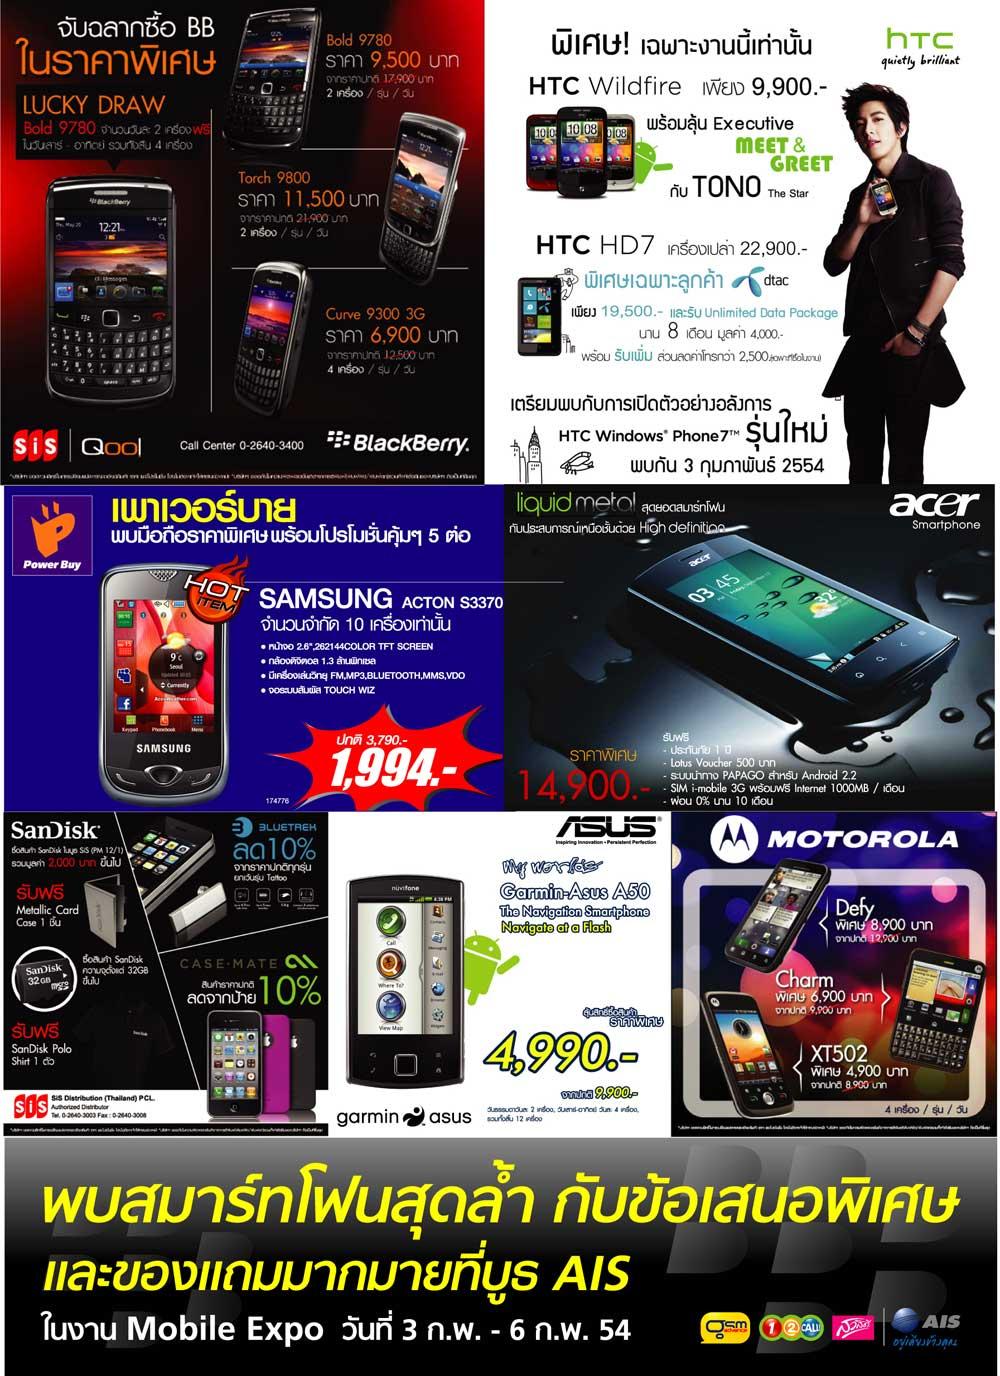 Promotion Thailandmobileexpo 4